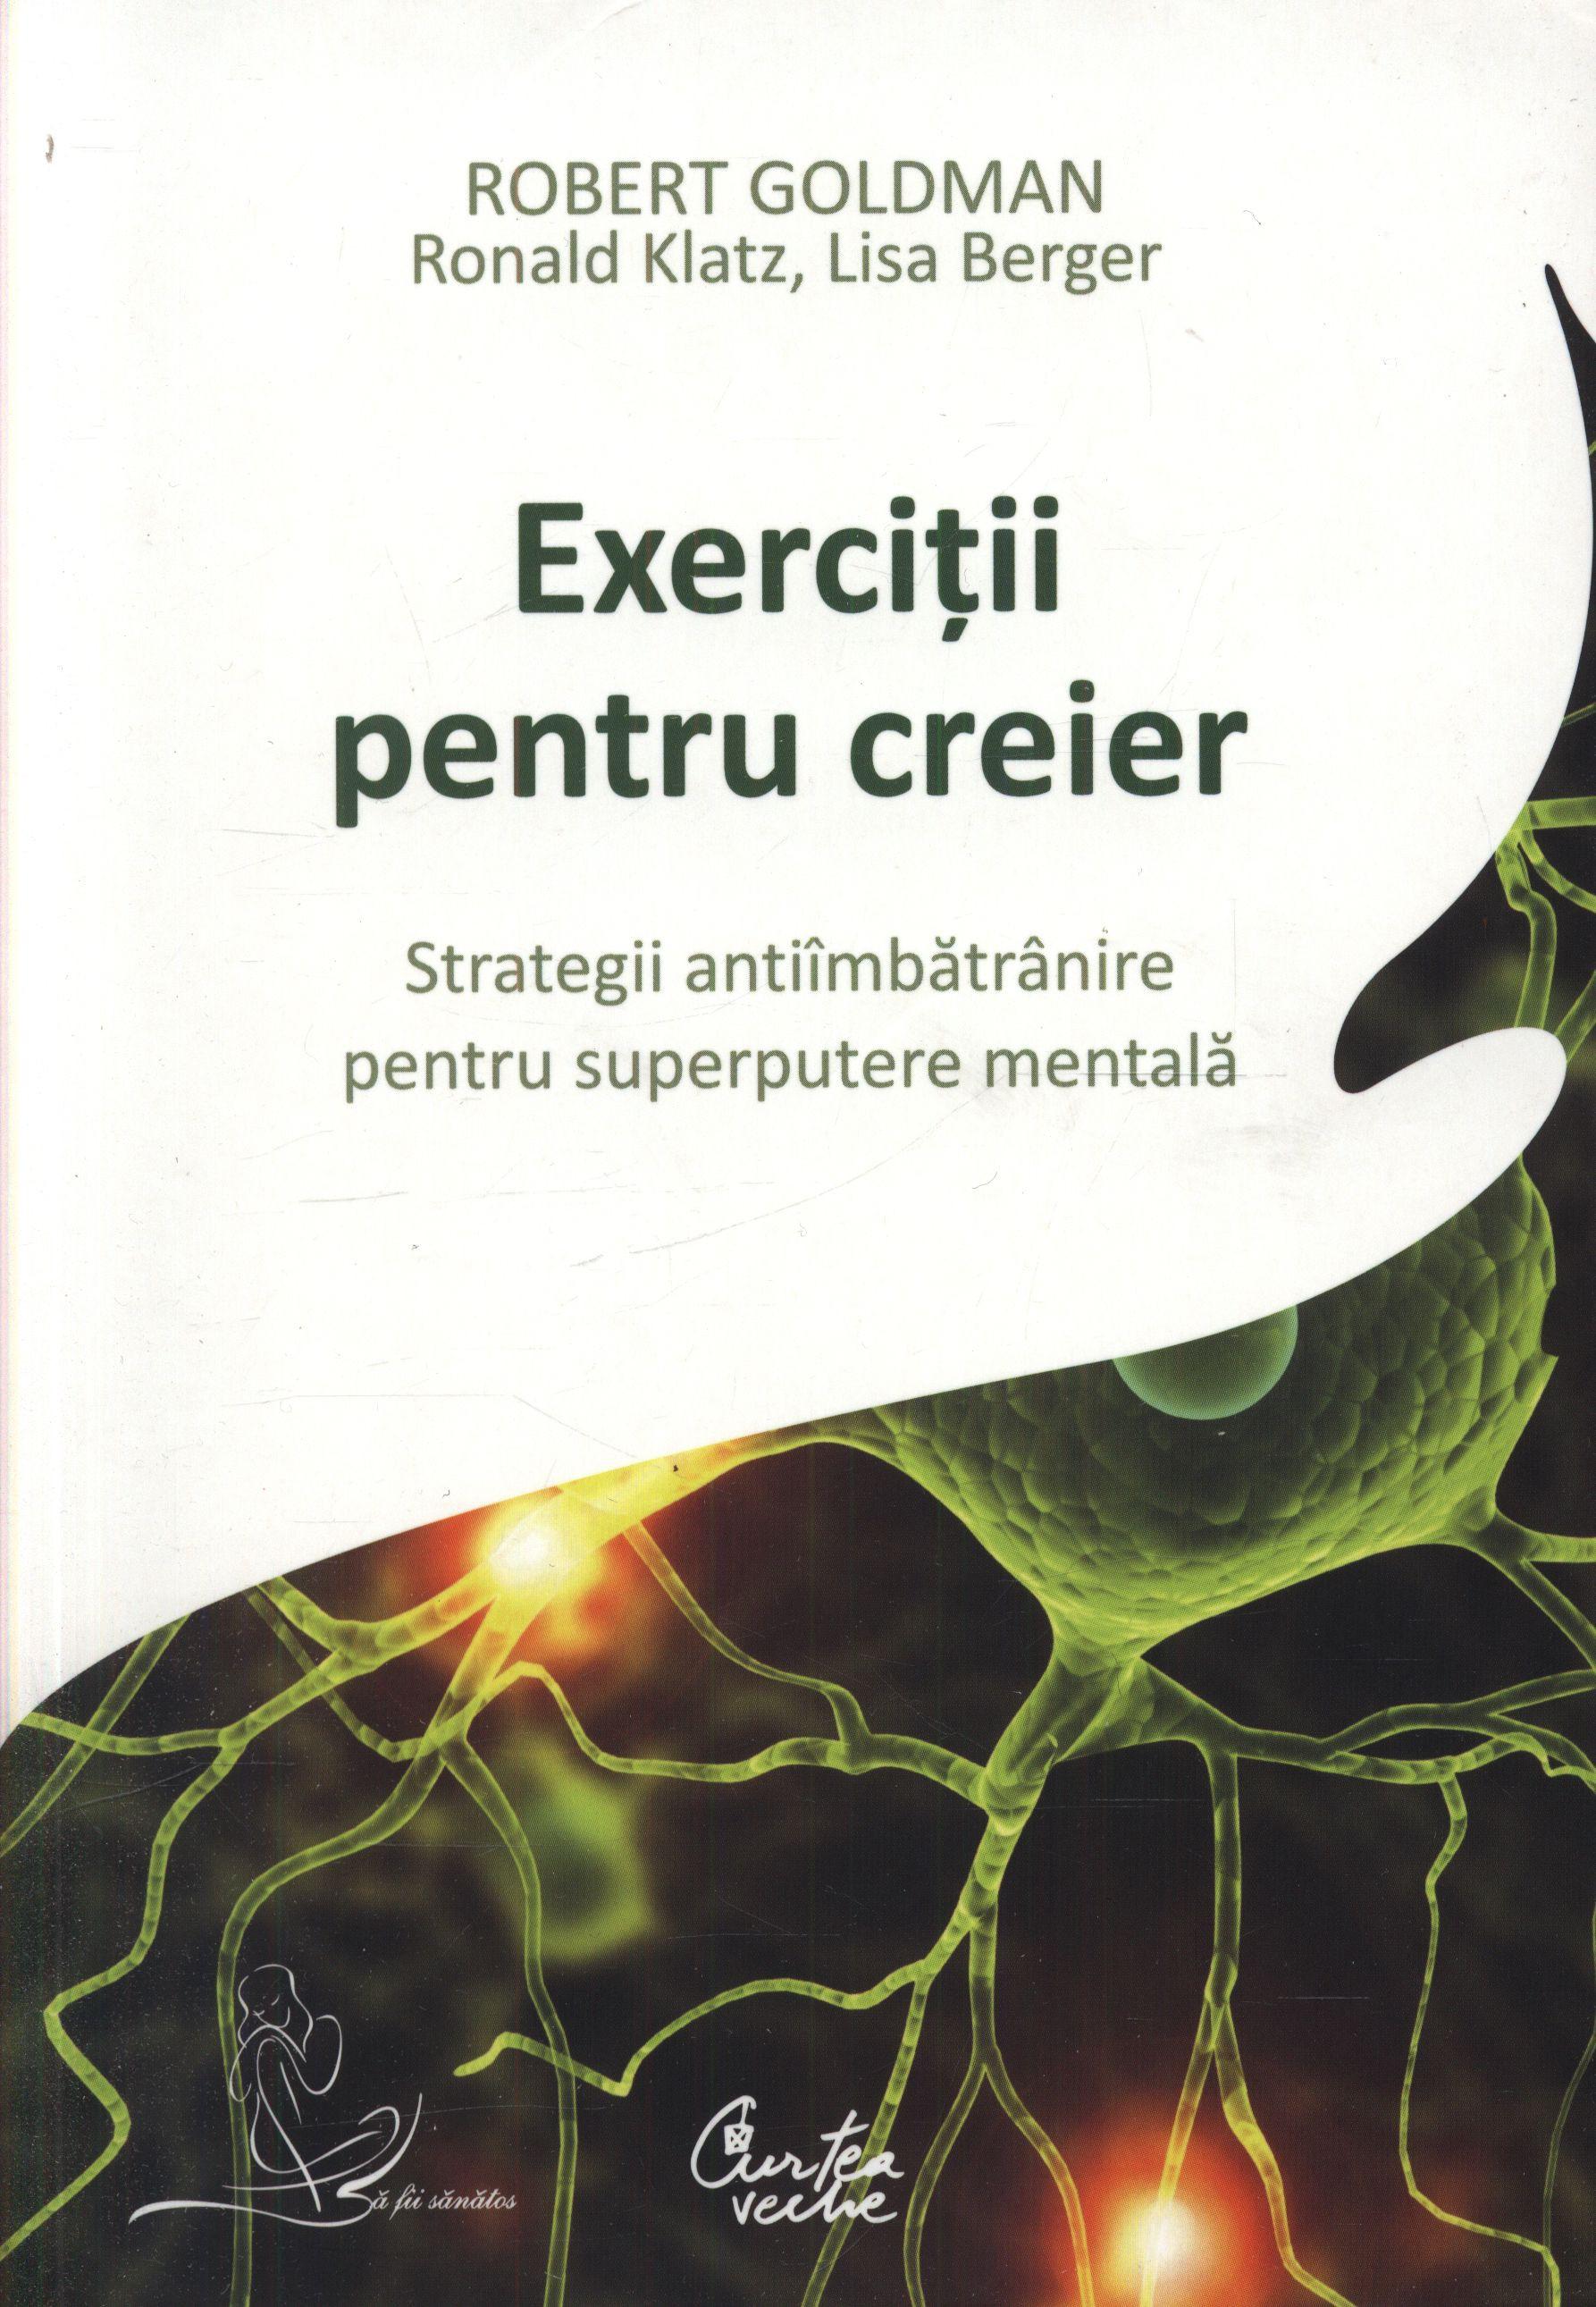 Exerciţii Pentru Creier - Robert Goldman  Lisa Berger şi Ronald Klatz